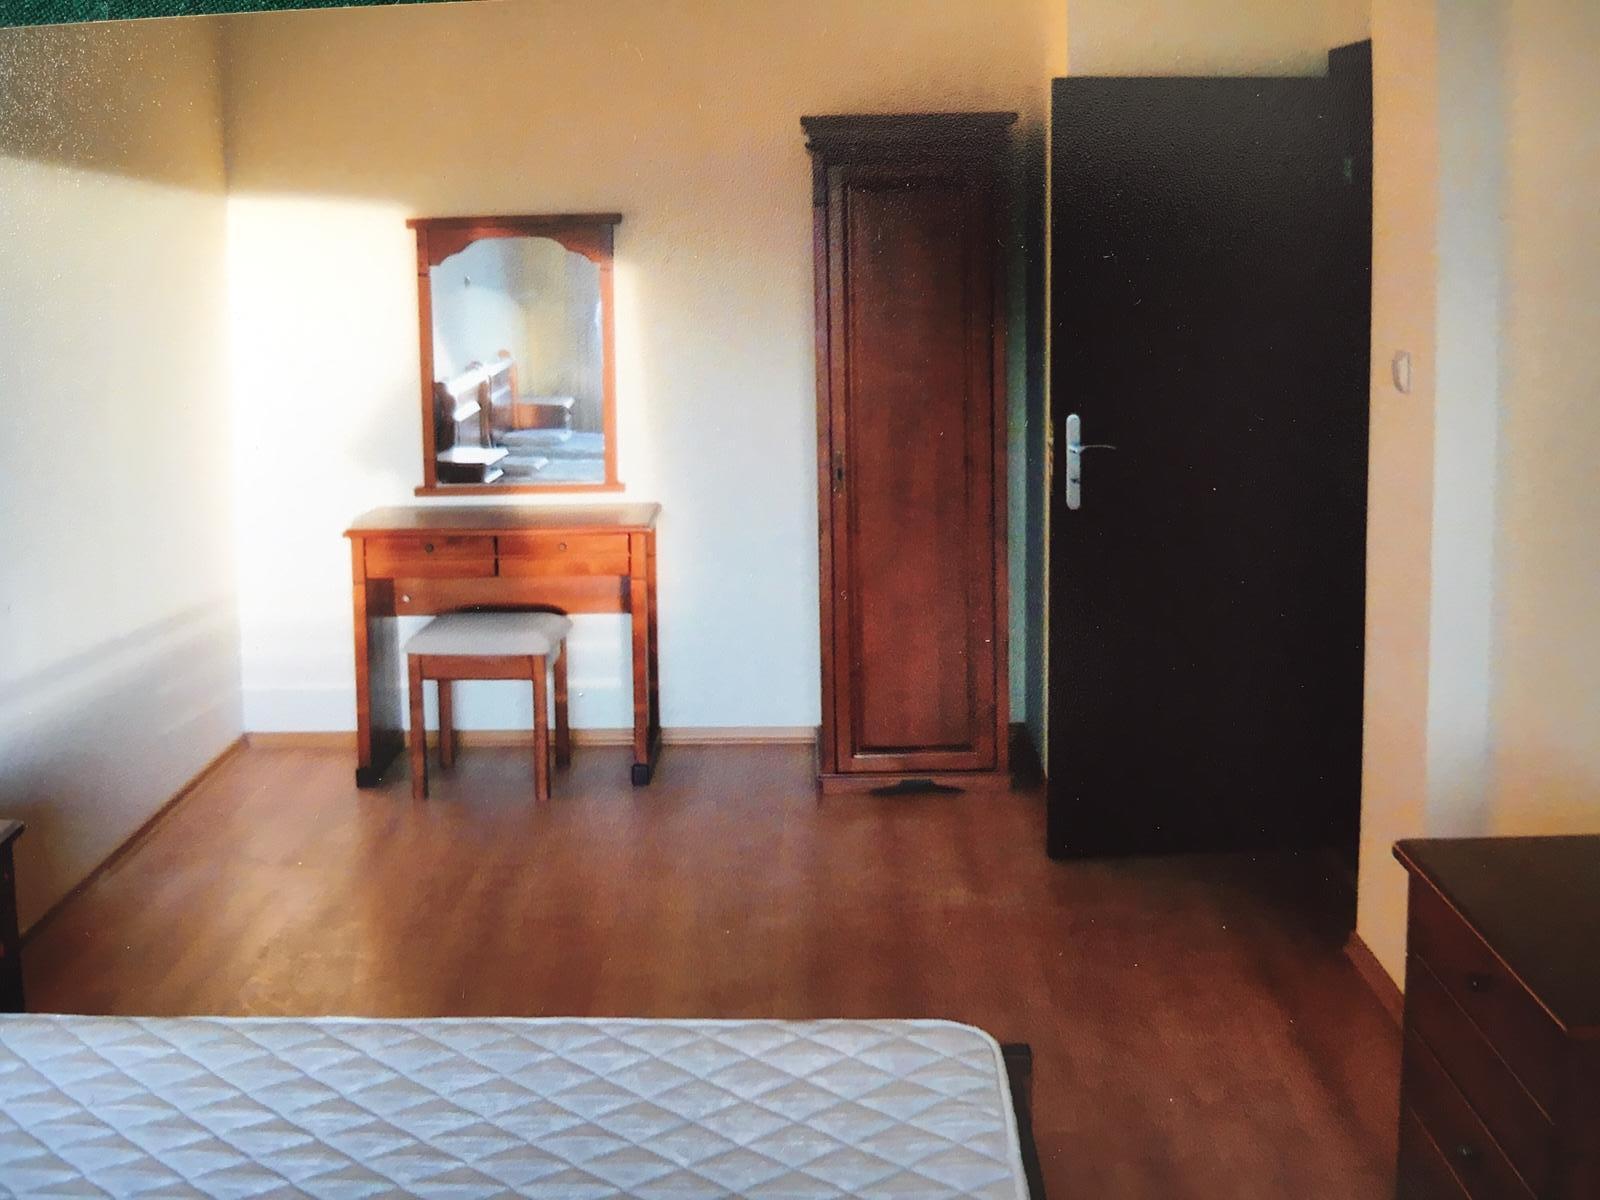 1569506669-sell-property-0a79ffa2-21d9-42c9-8866-459bf0707476.jpg